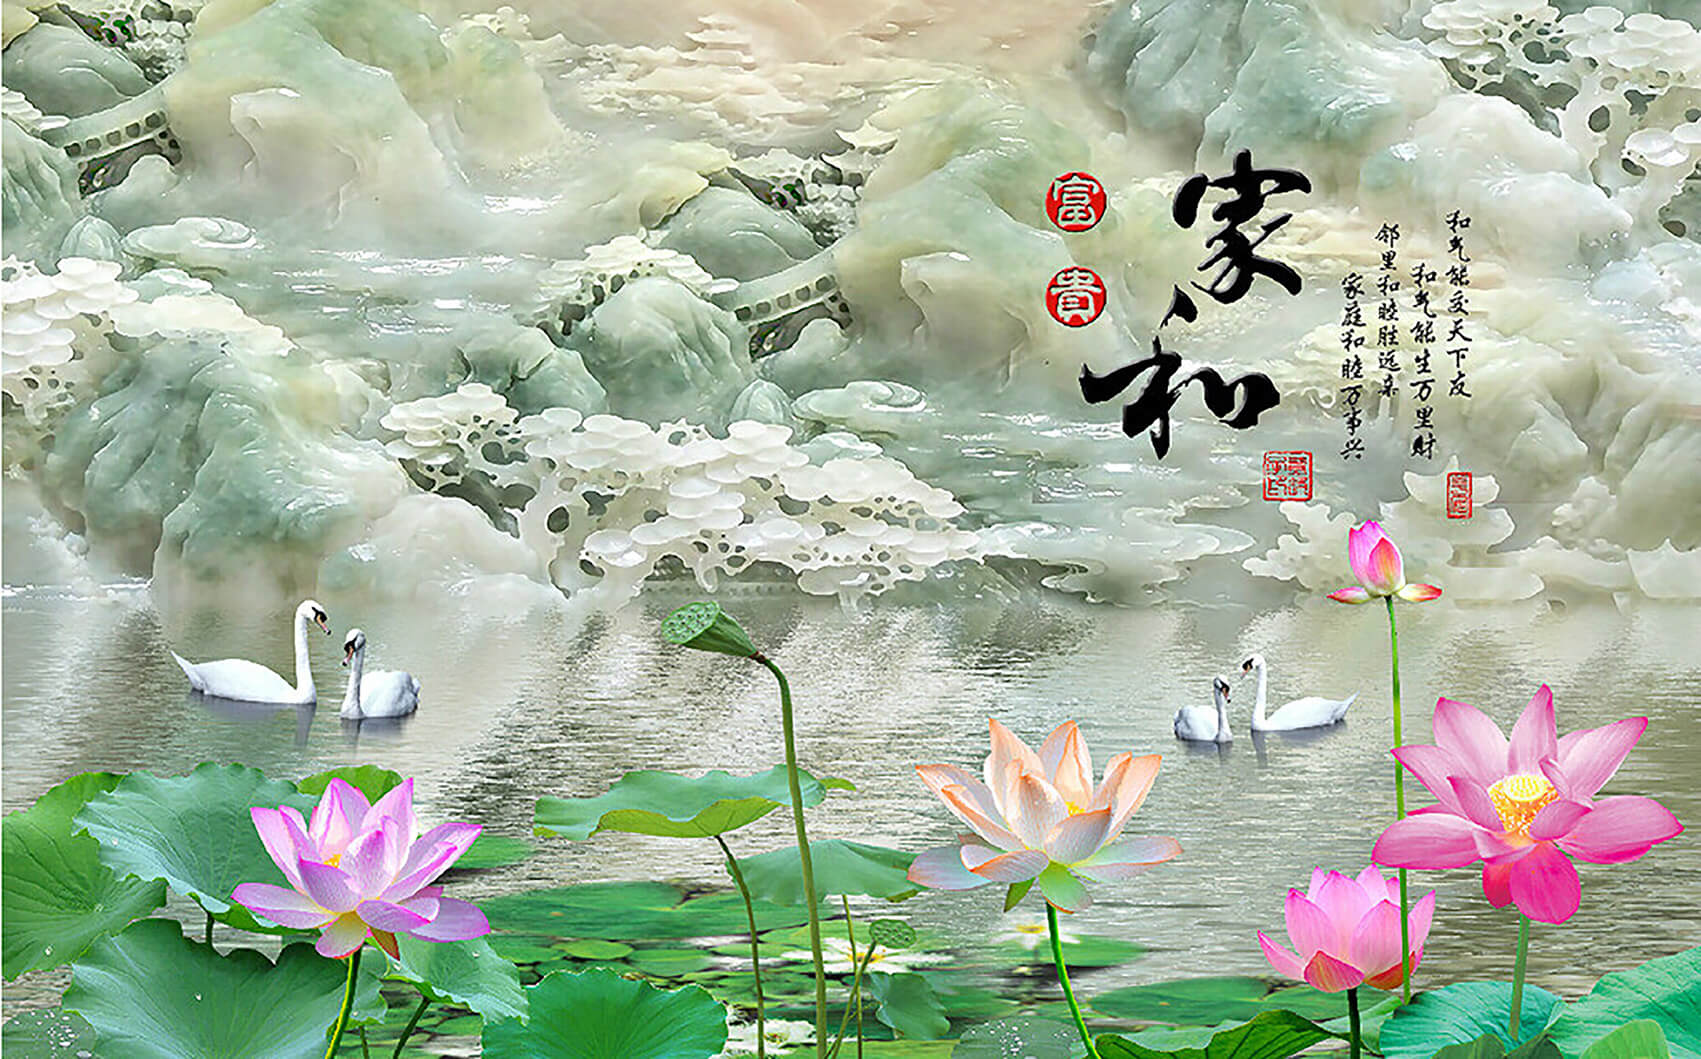 tranh-dan-tuong-gia-ngoc-7406